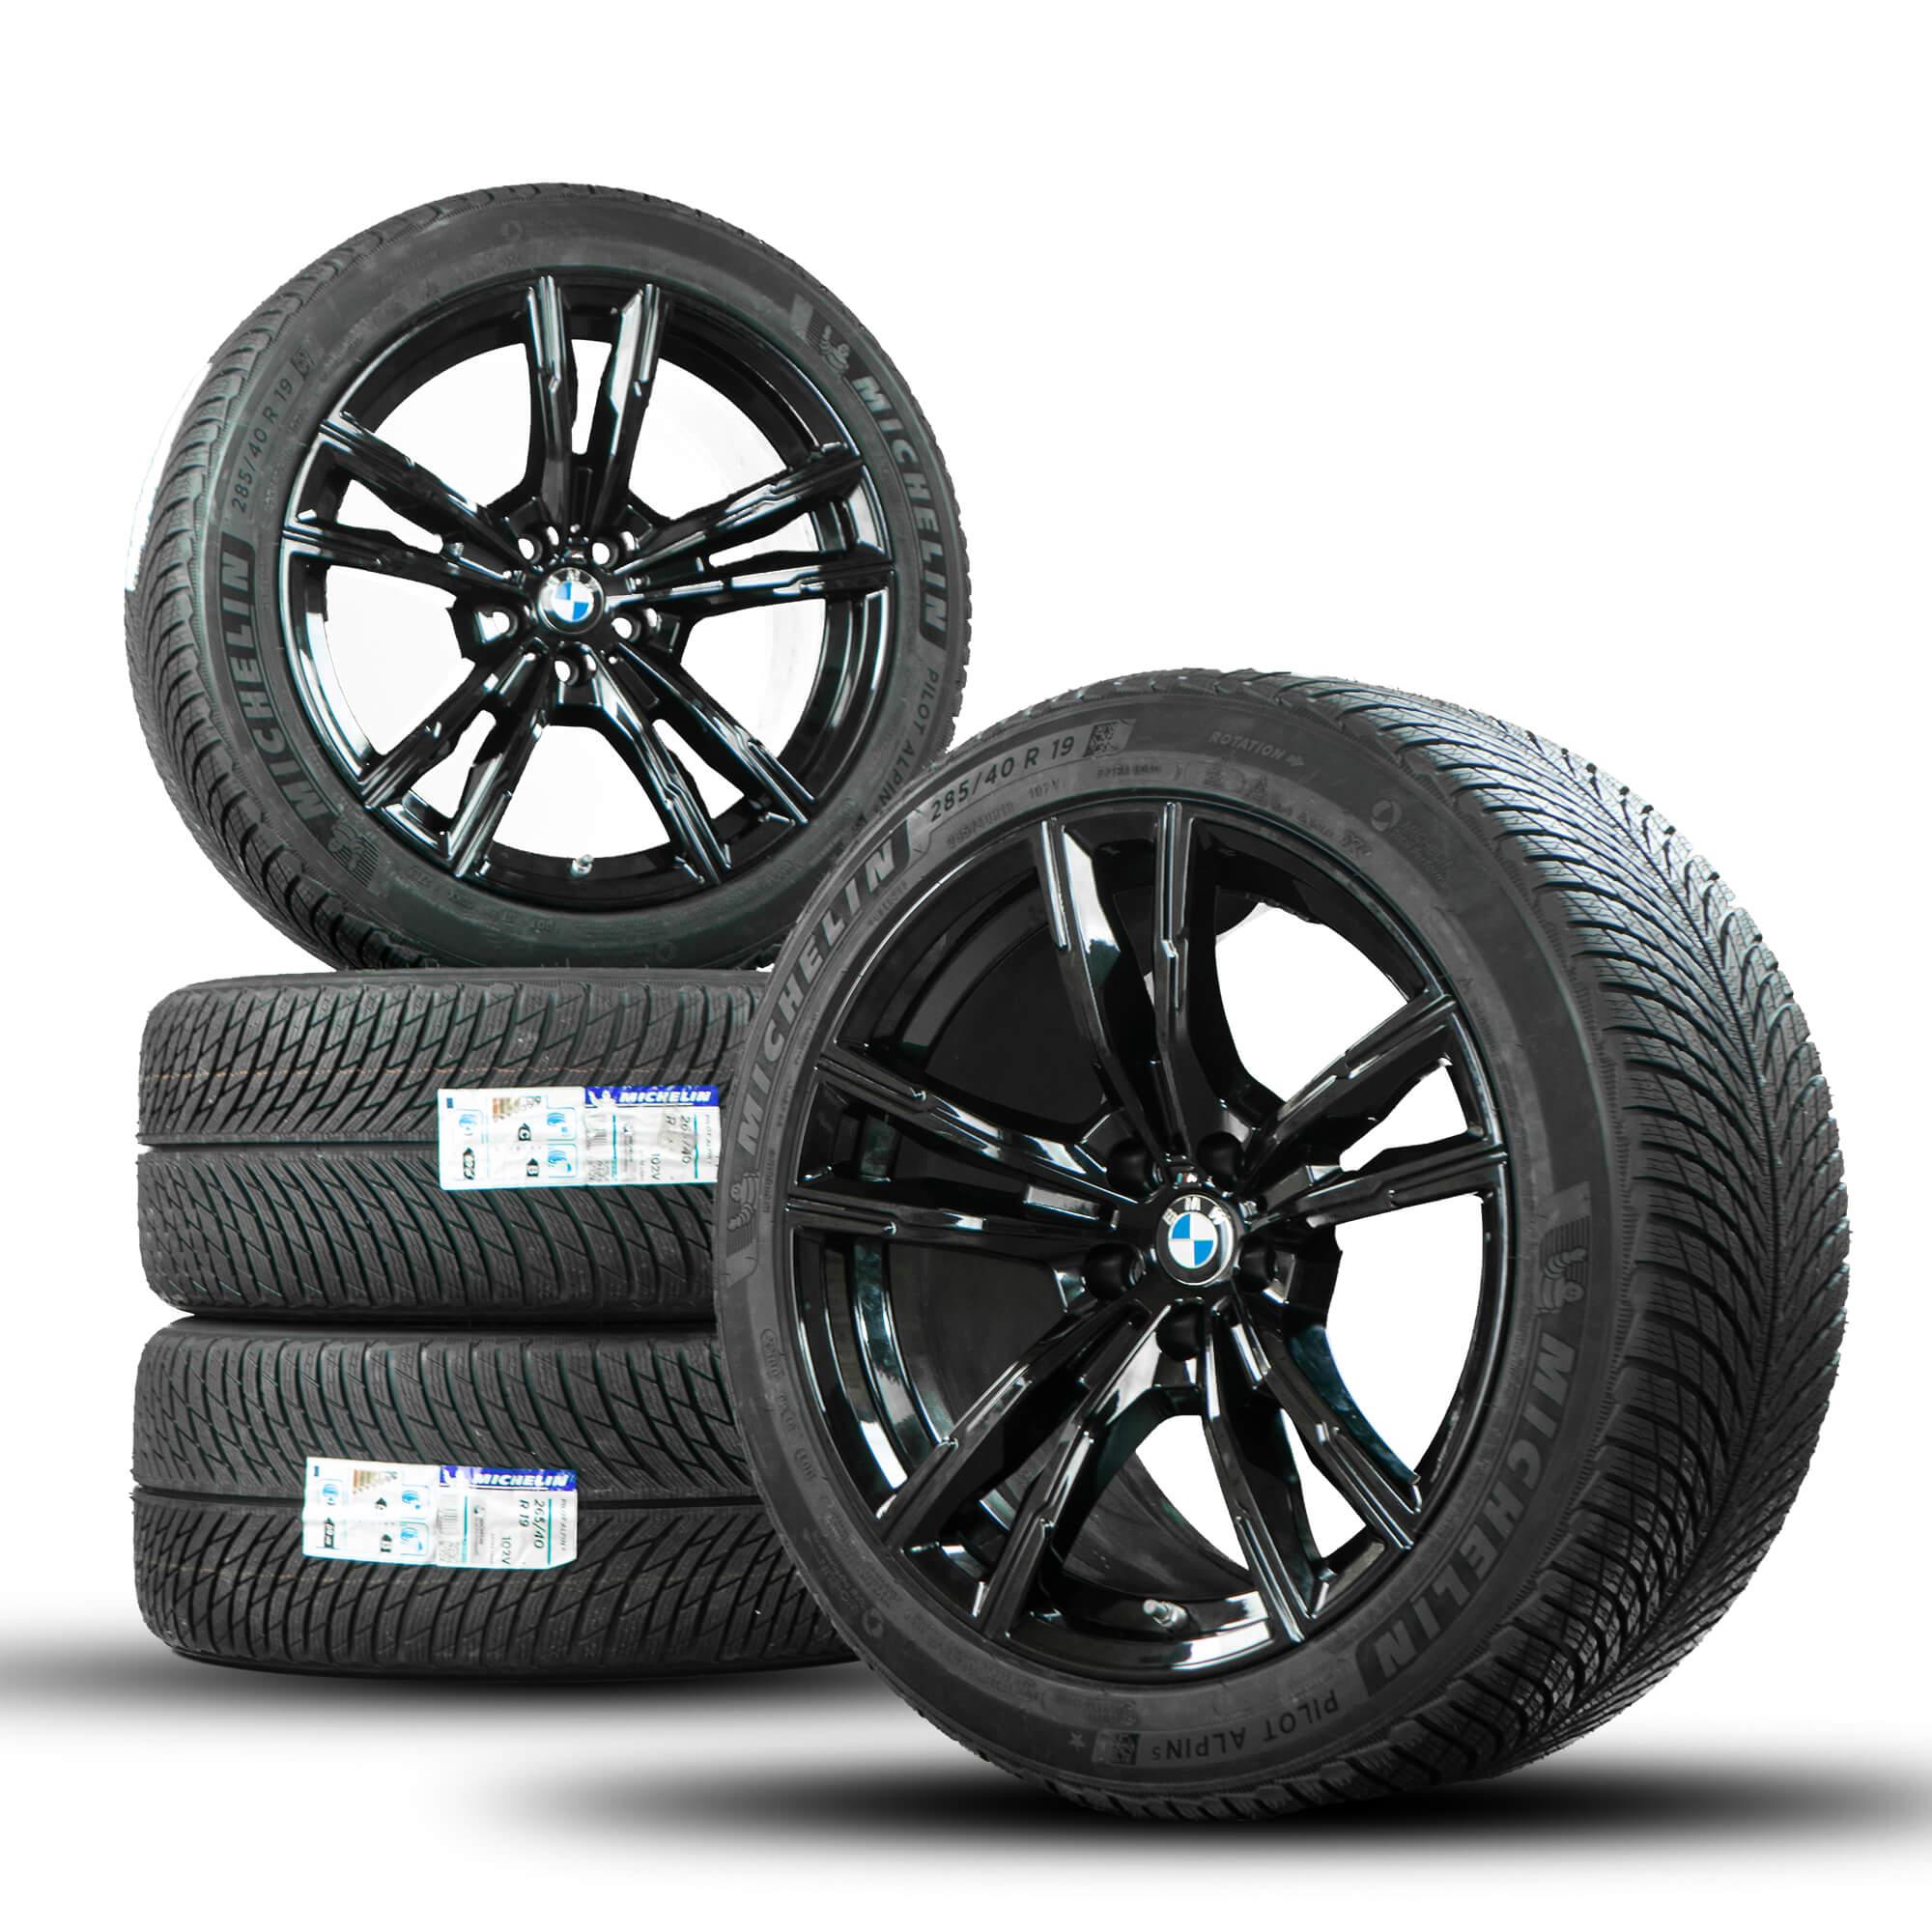 Bmw 19 Inch Rims M8 Coupe F91 F92 F93 M812 Winter Tires Winter